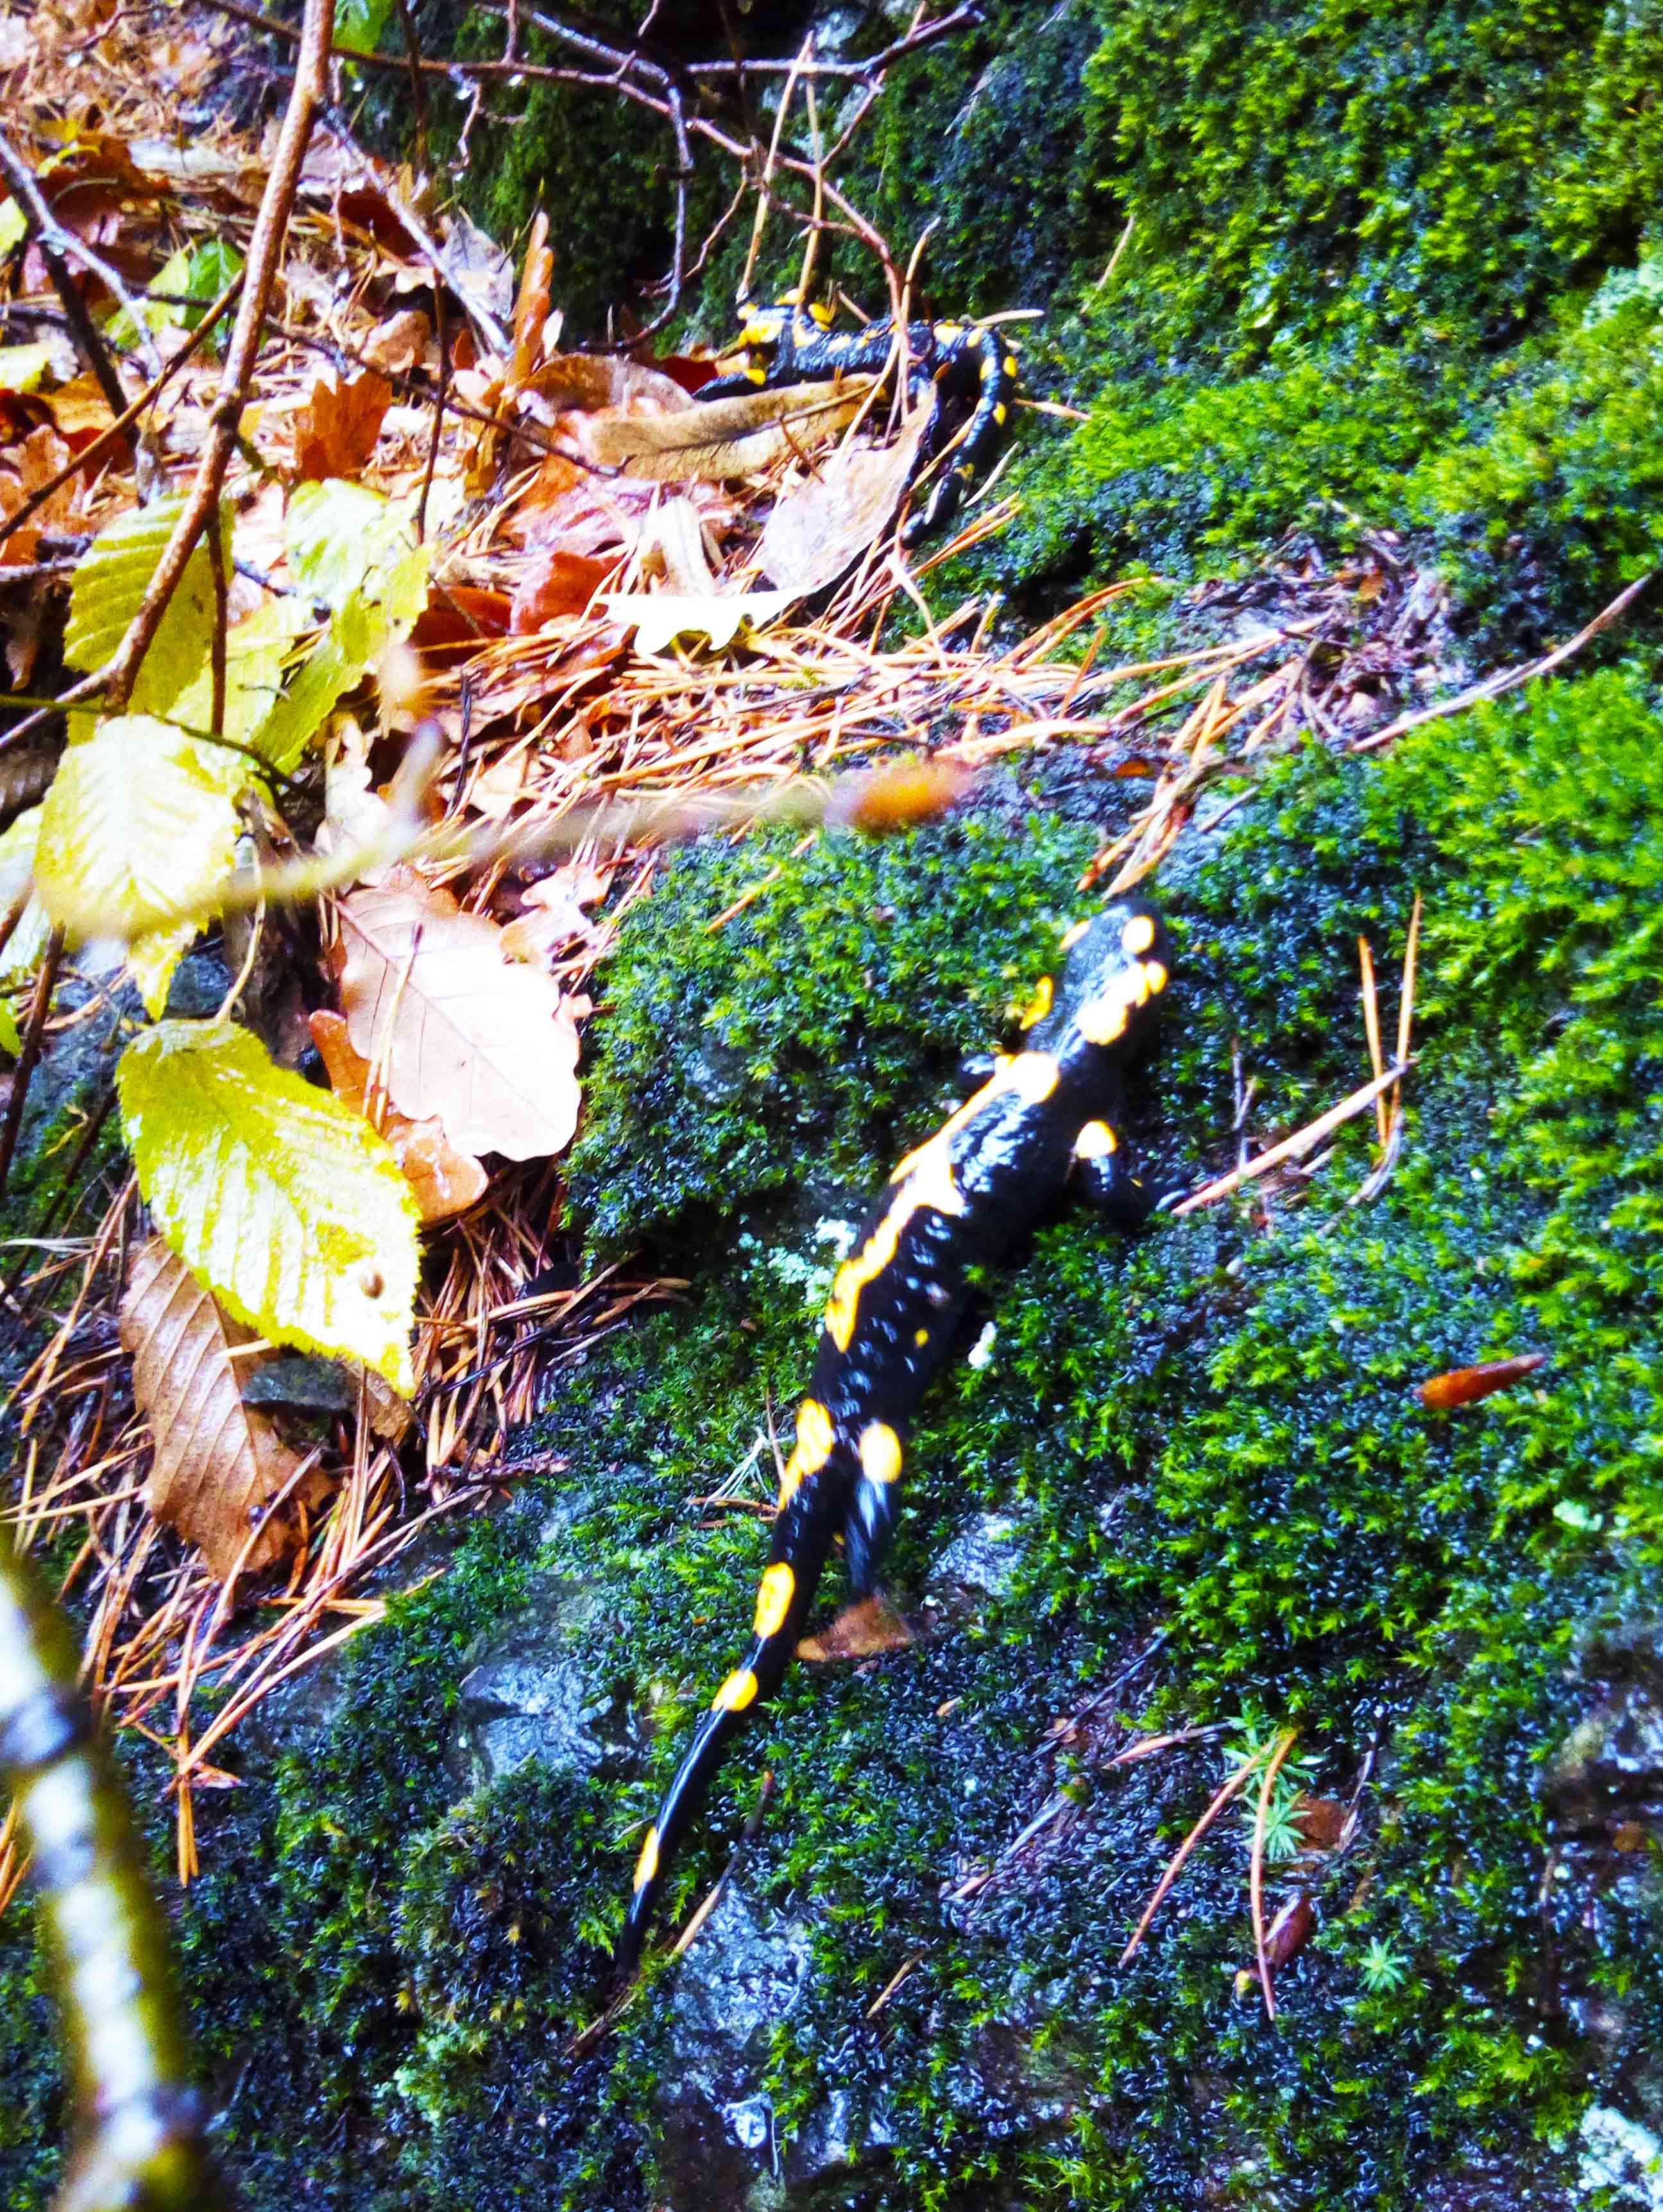 salamandra in cozia